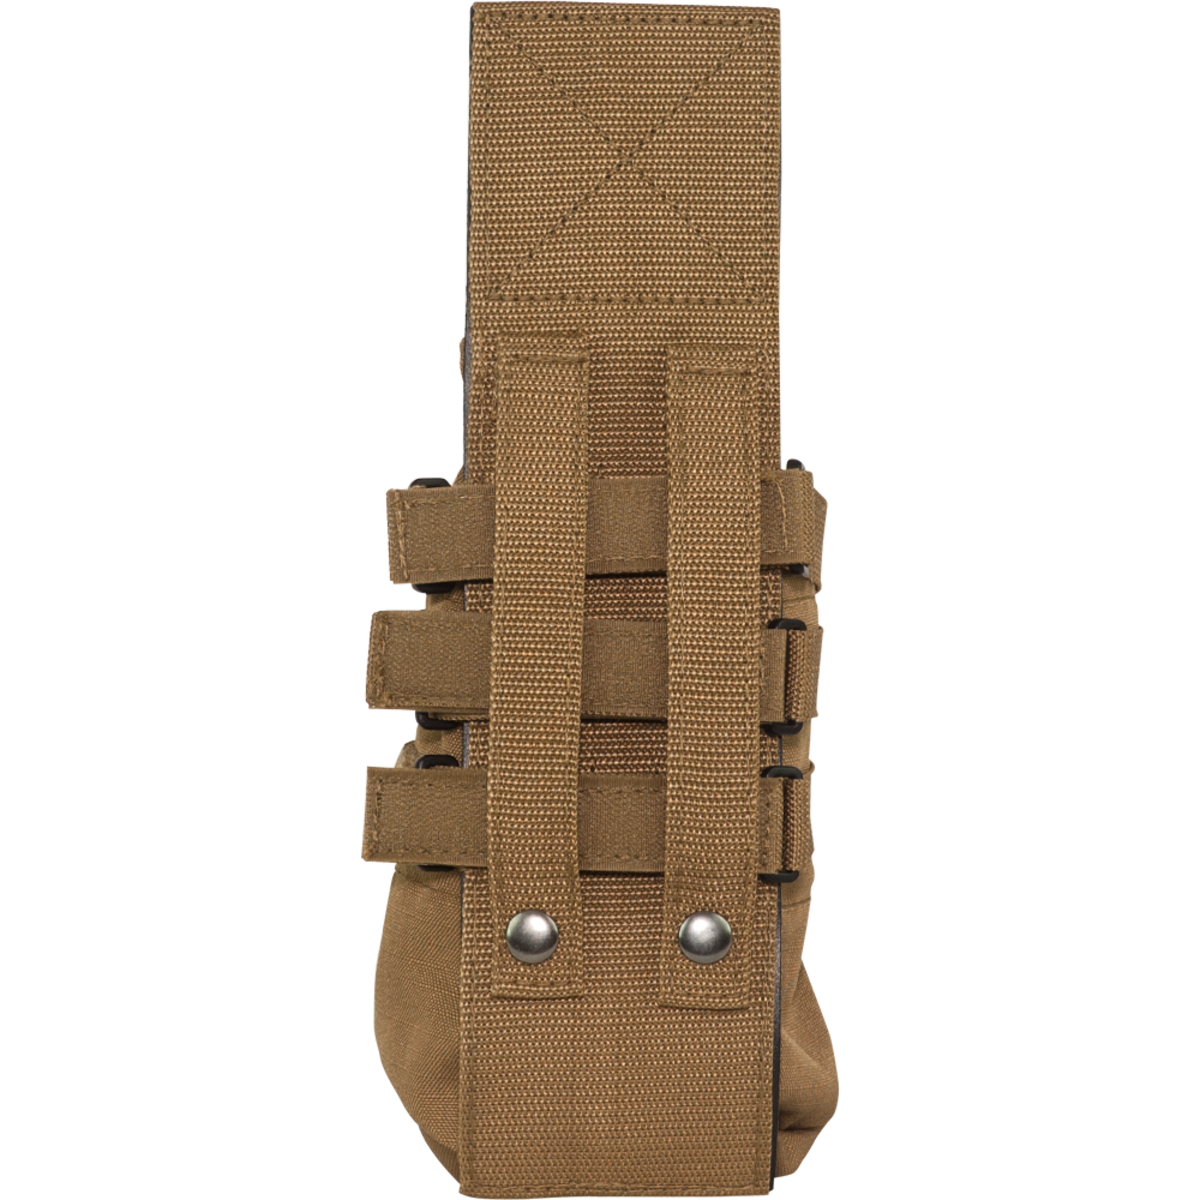 Valken Valken Universal HPA Tank MOLLE Pouch